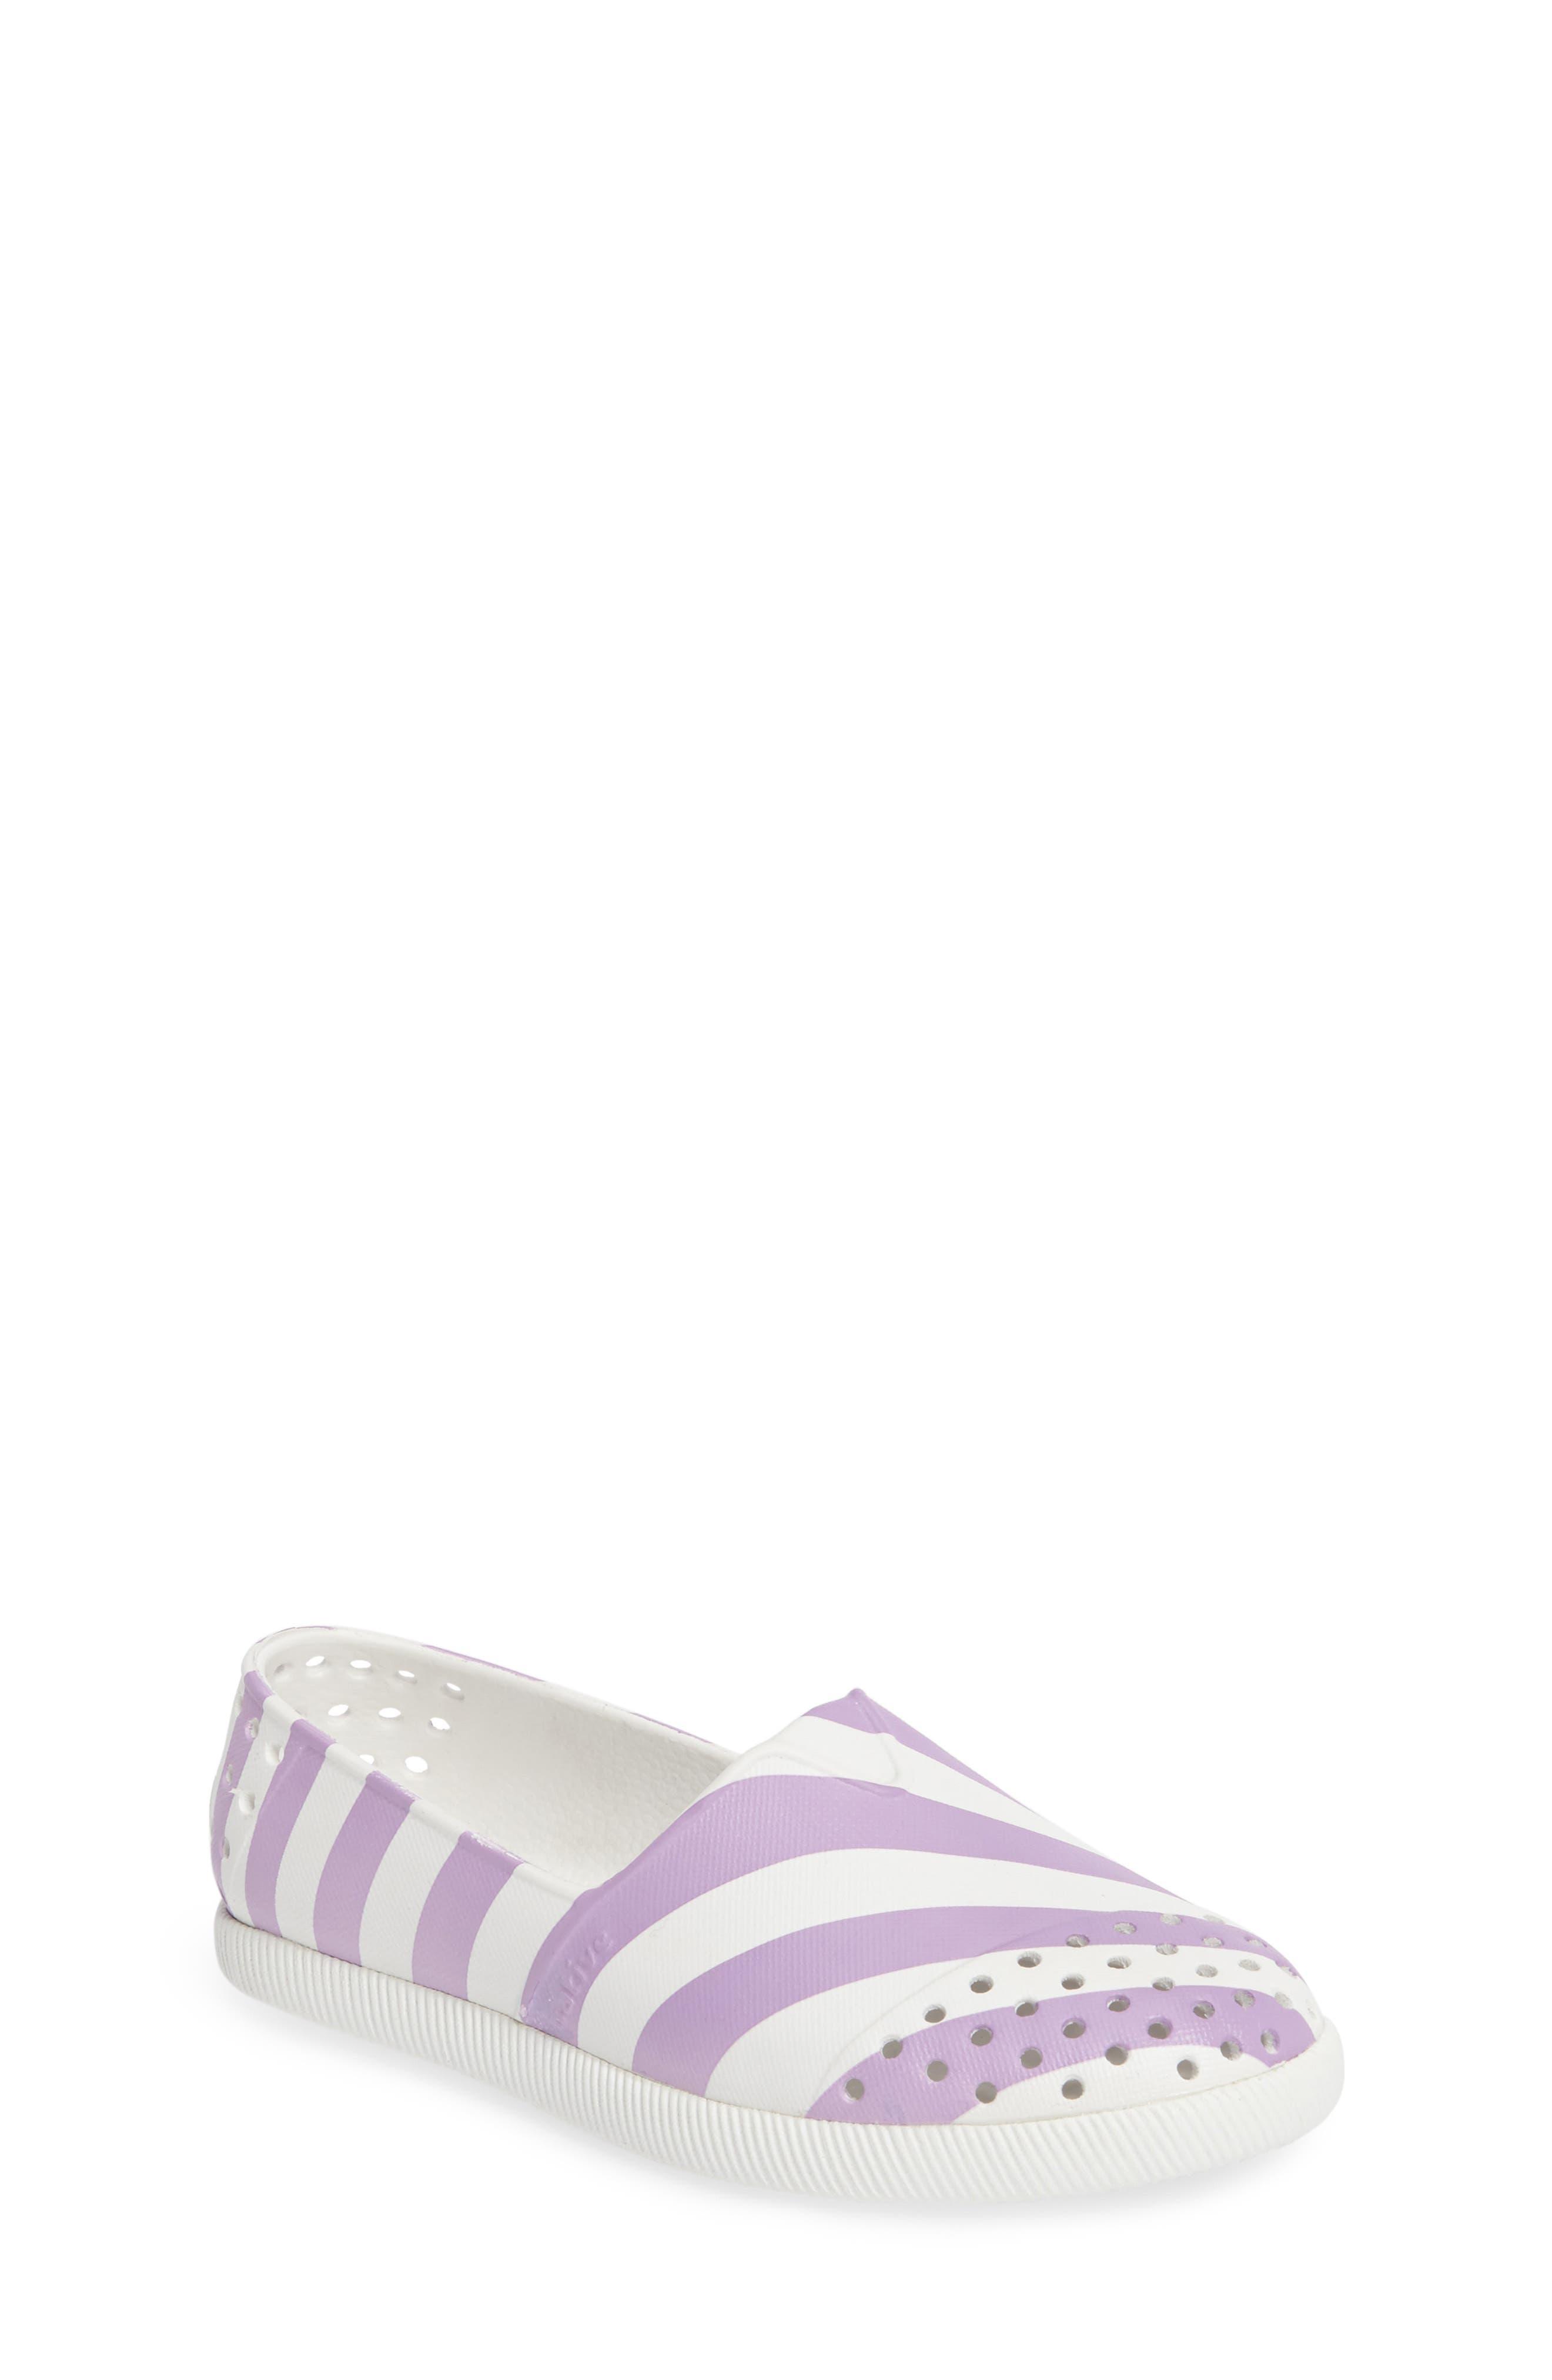 NATIVE SHOES Verona Slip-On Sneaker